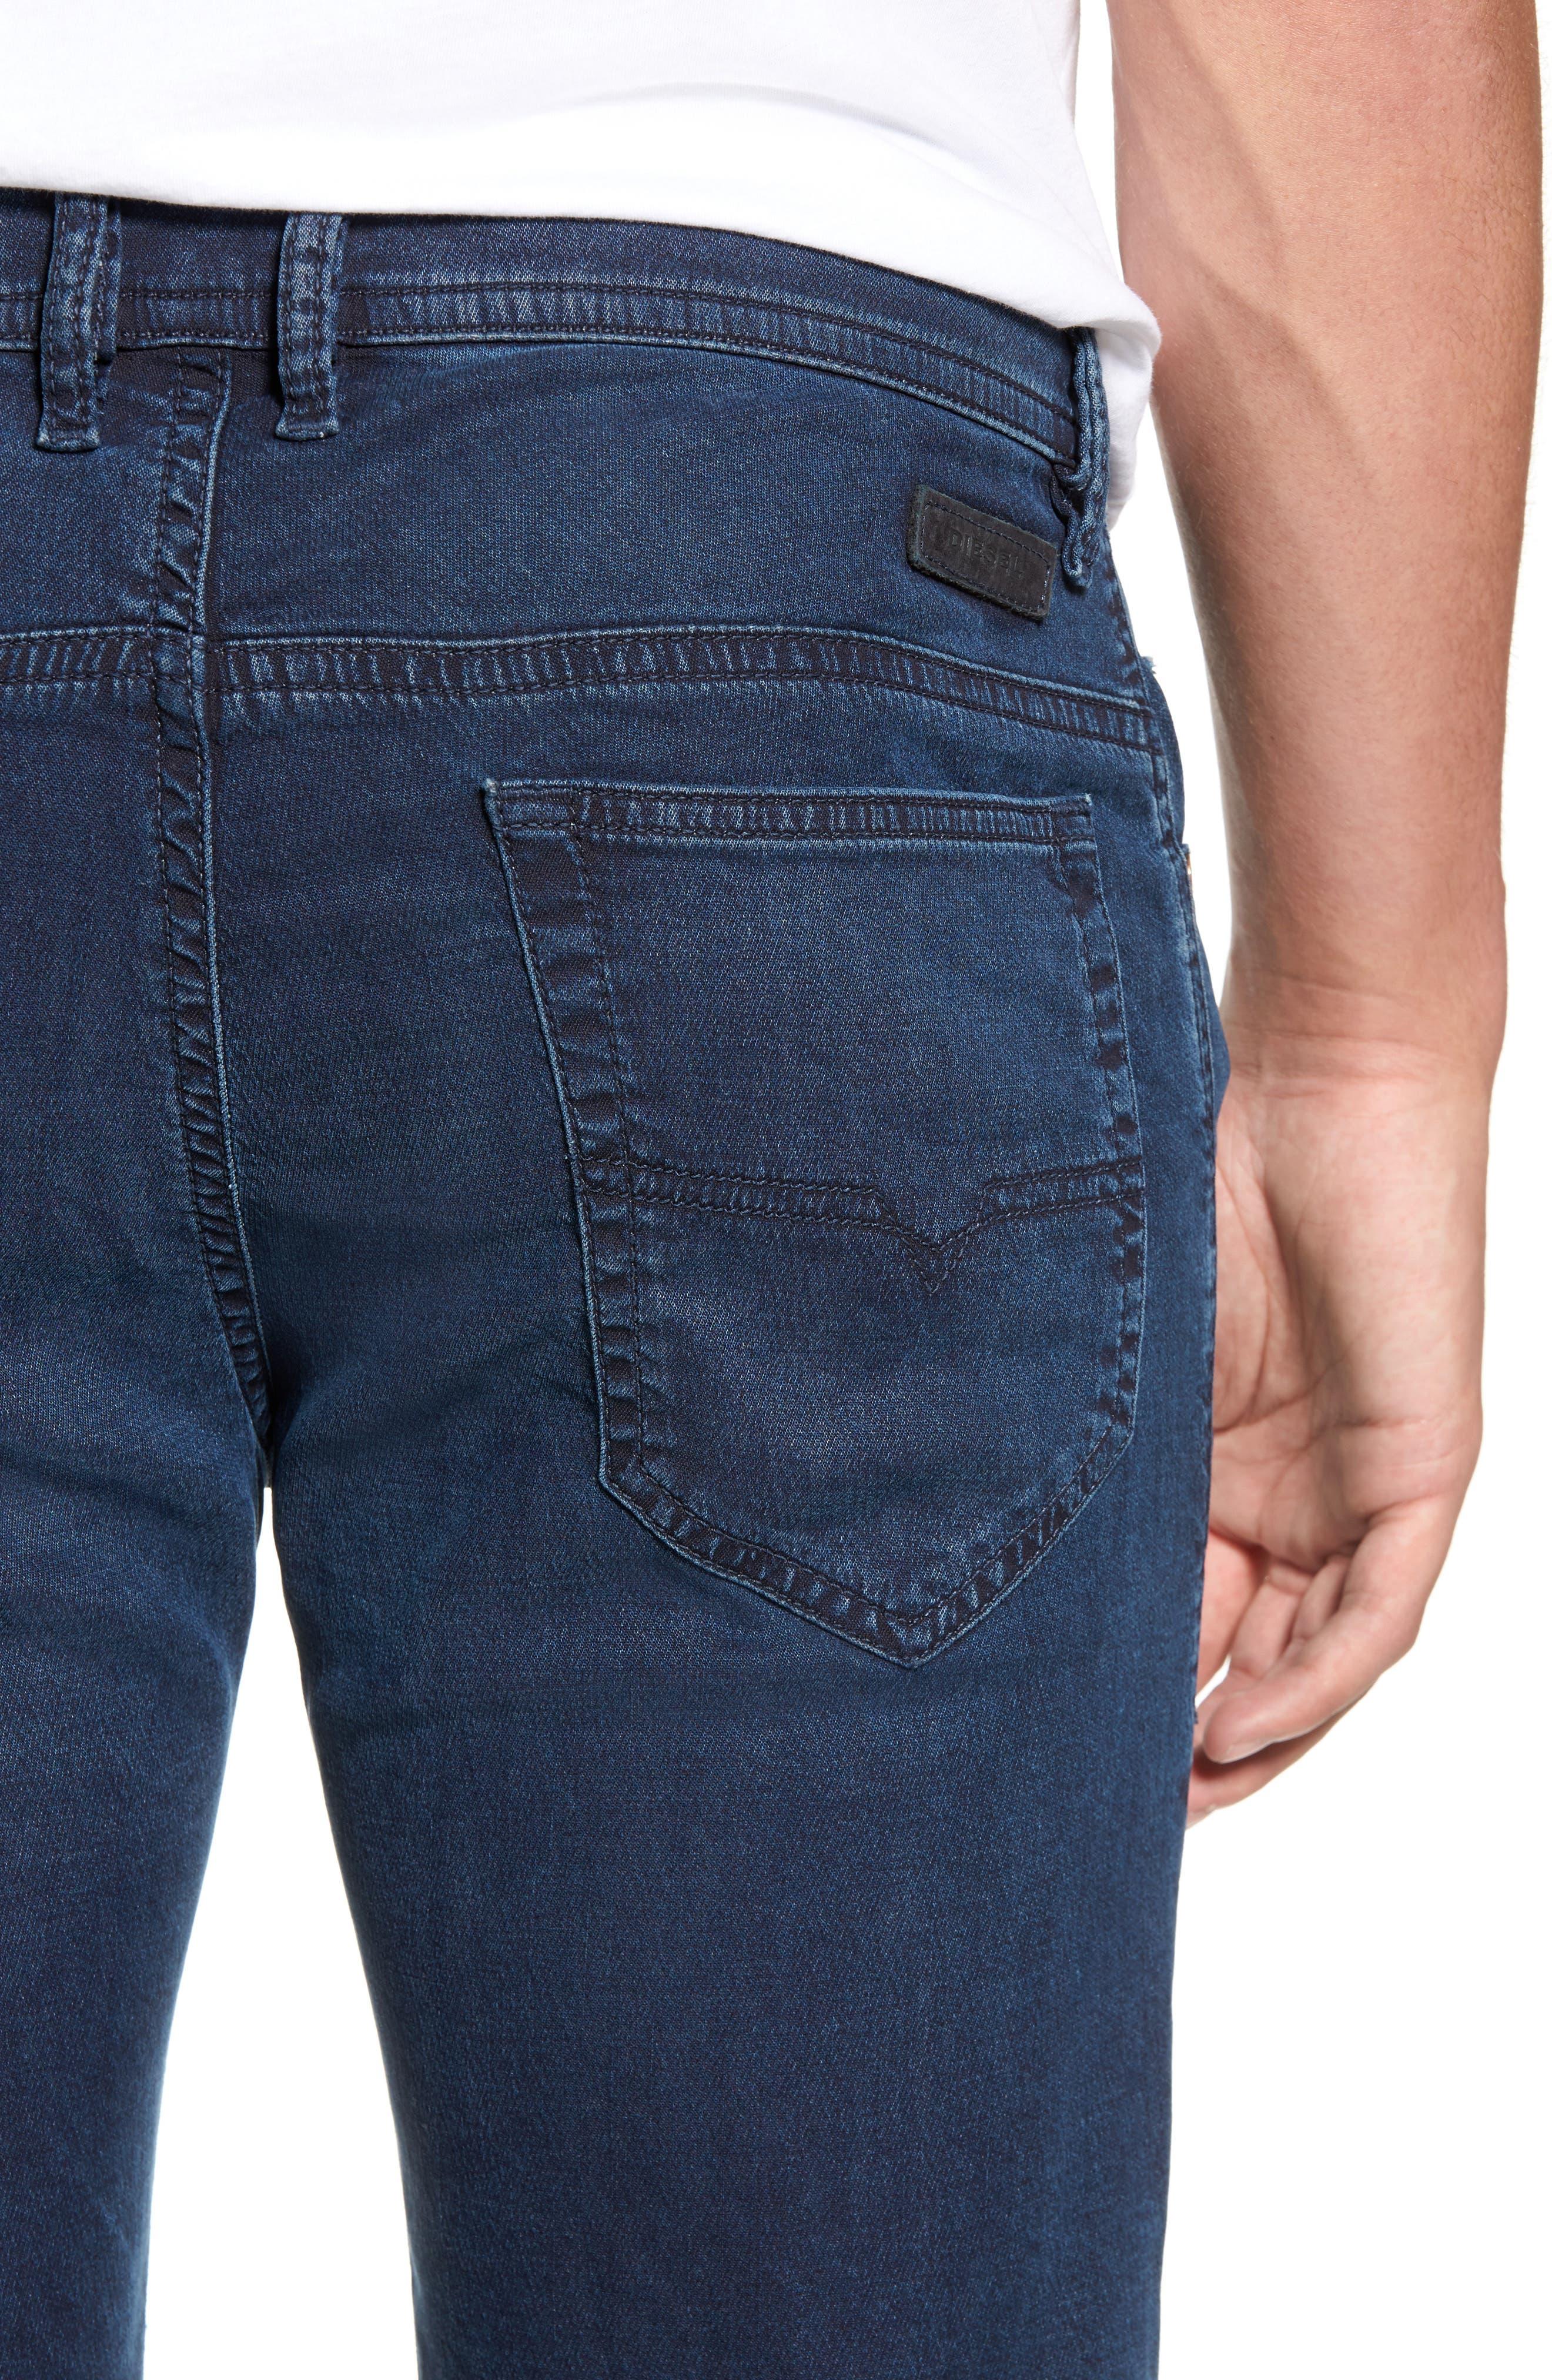 Thommer Slim Fit Jeans,                             Alternate thumbnail 4, color,                             0688J